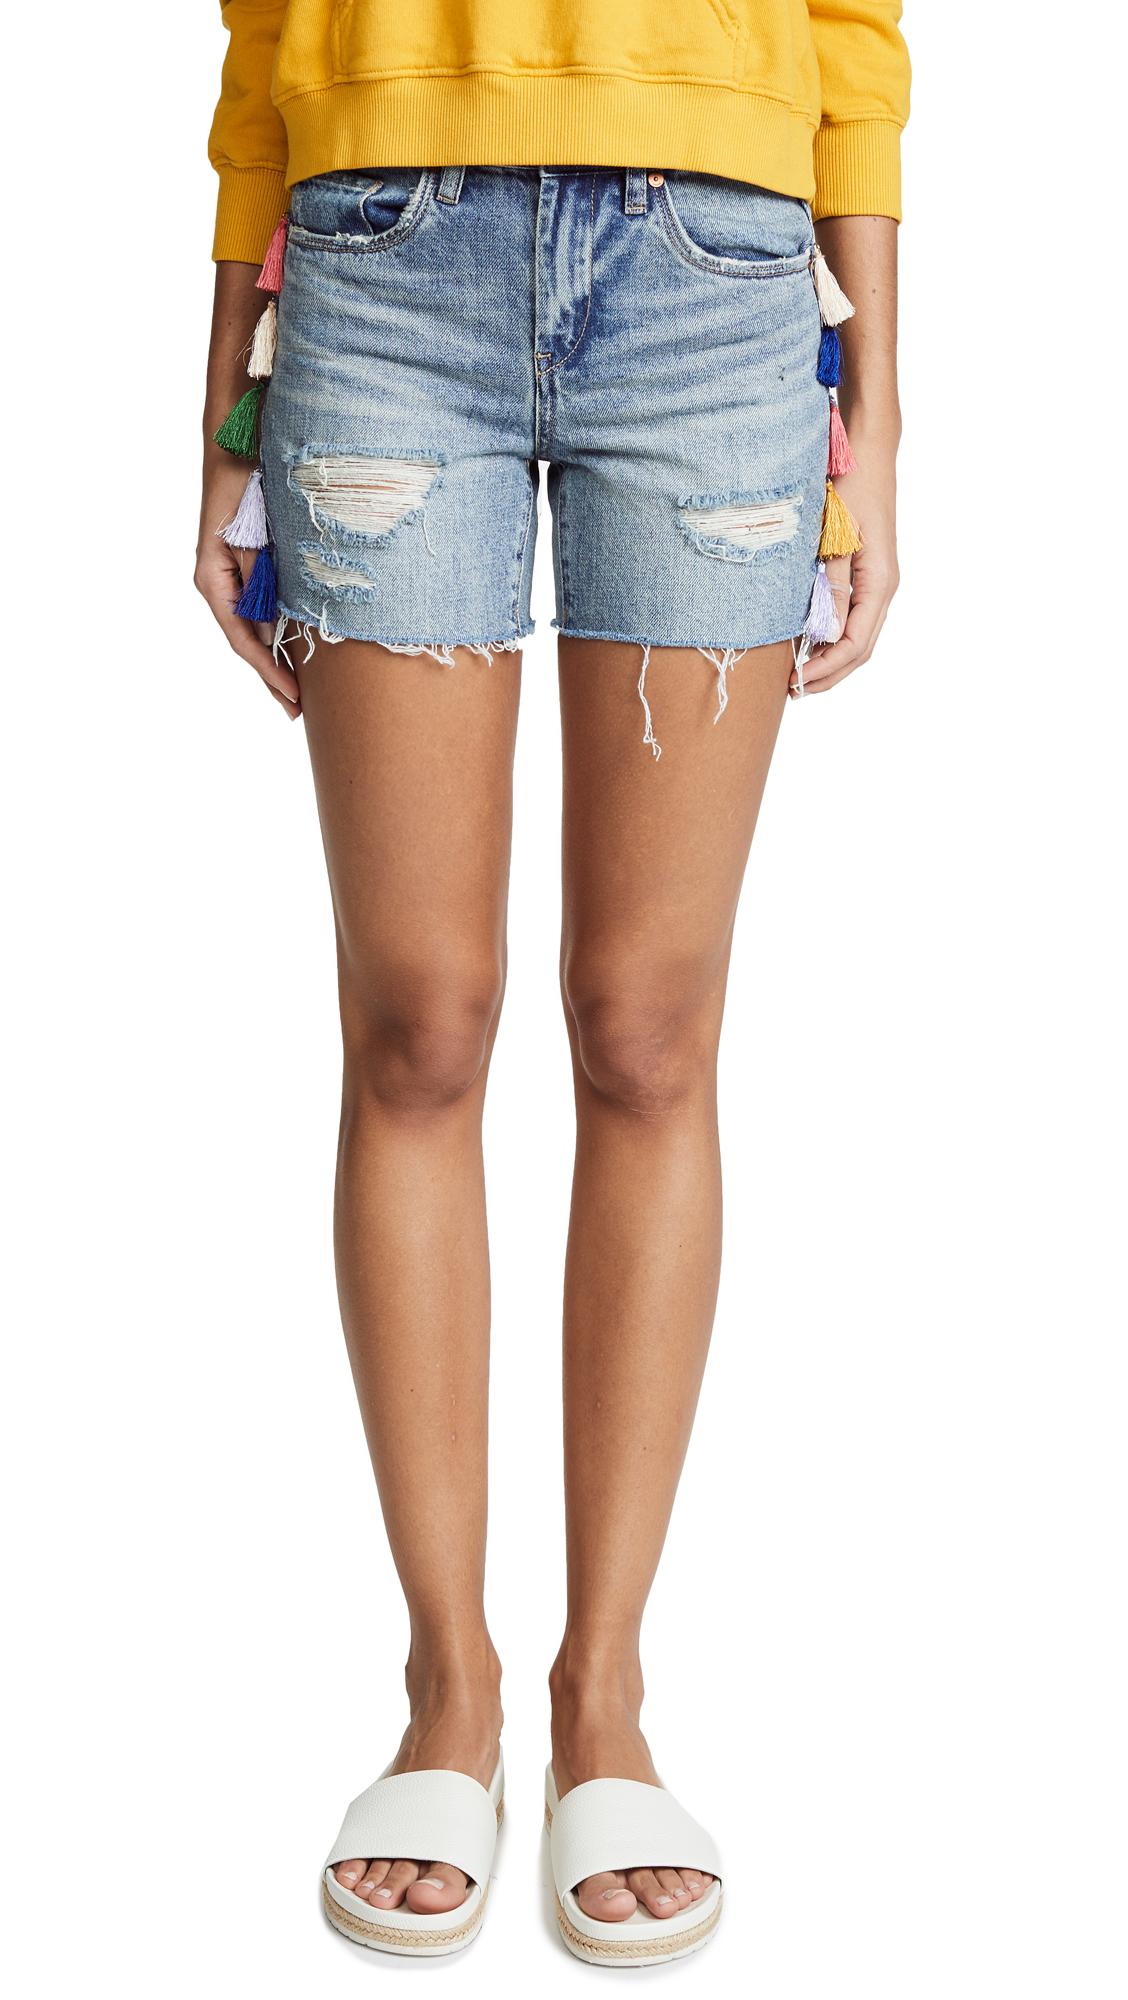 Blank Denim High Rise Shorts with Tassels